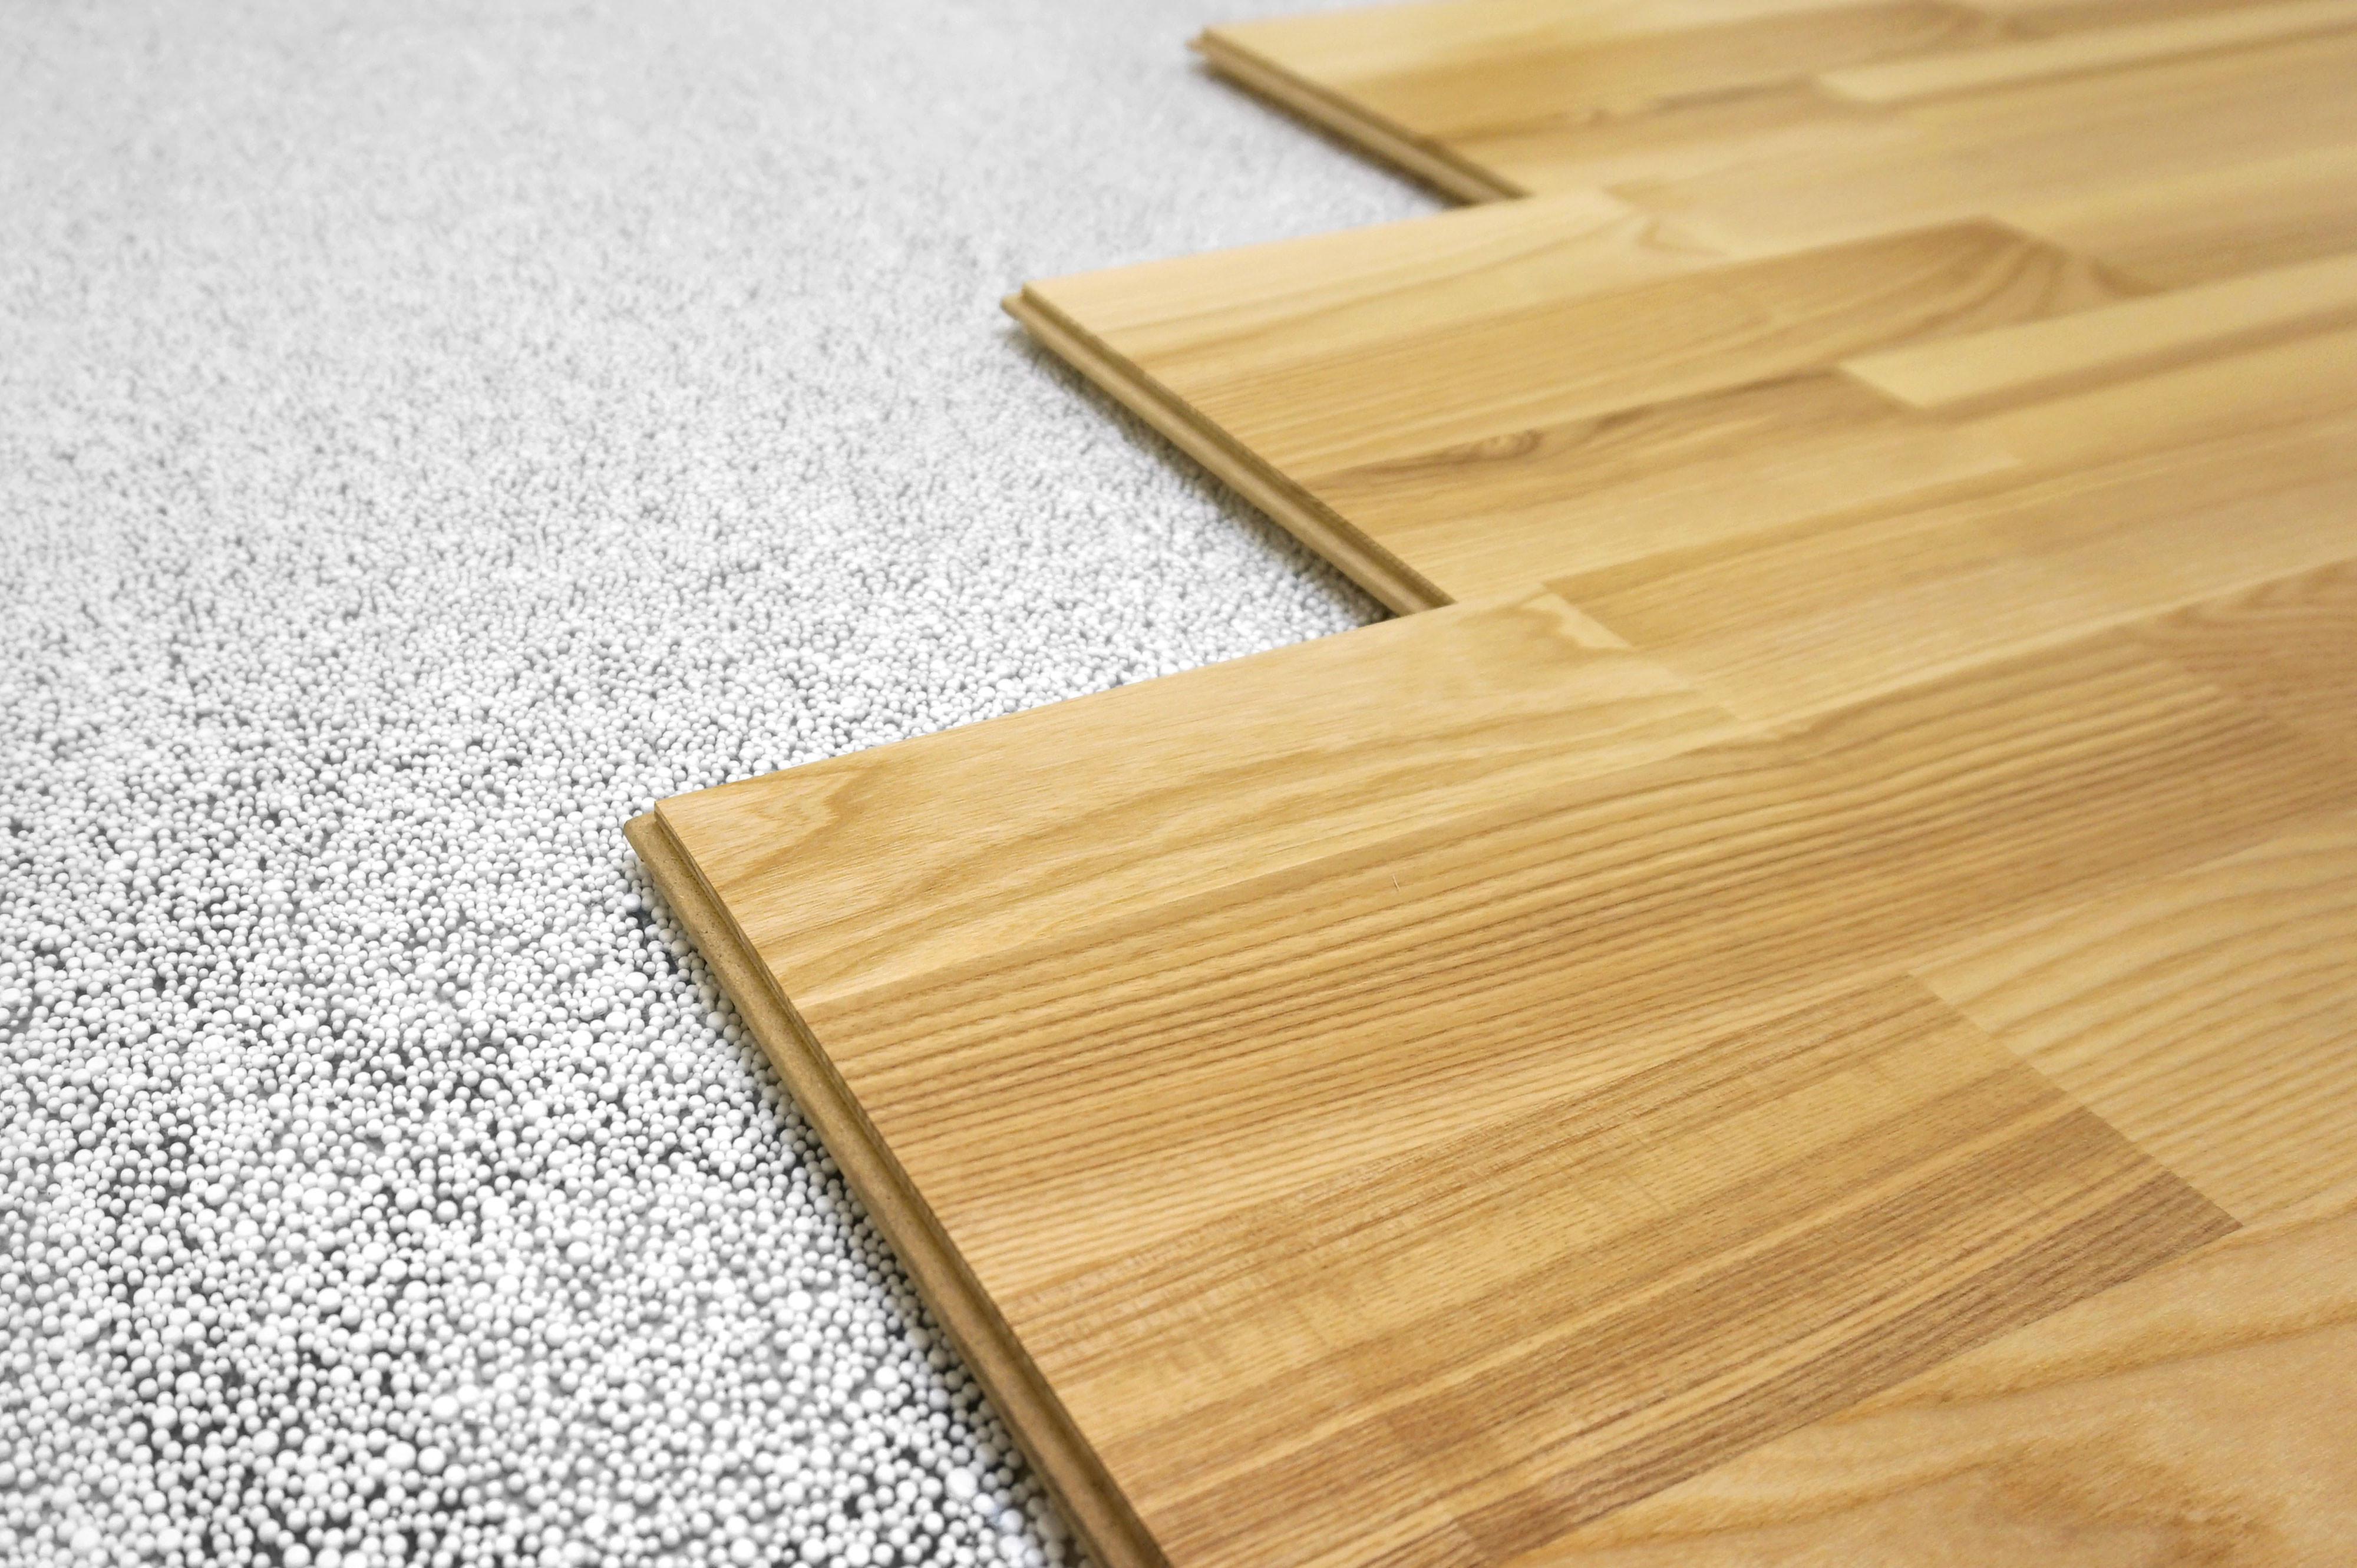 lm hardwood flooring of tish flooring kitchen decor items luxury kitchen kitchen floors inside tish flooring what does it cost to install laminate flooring